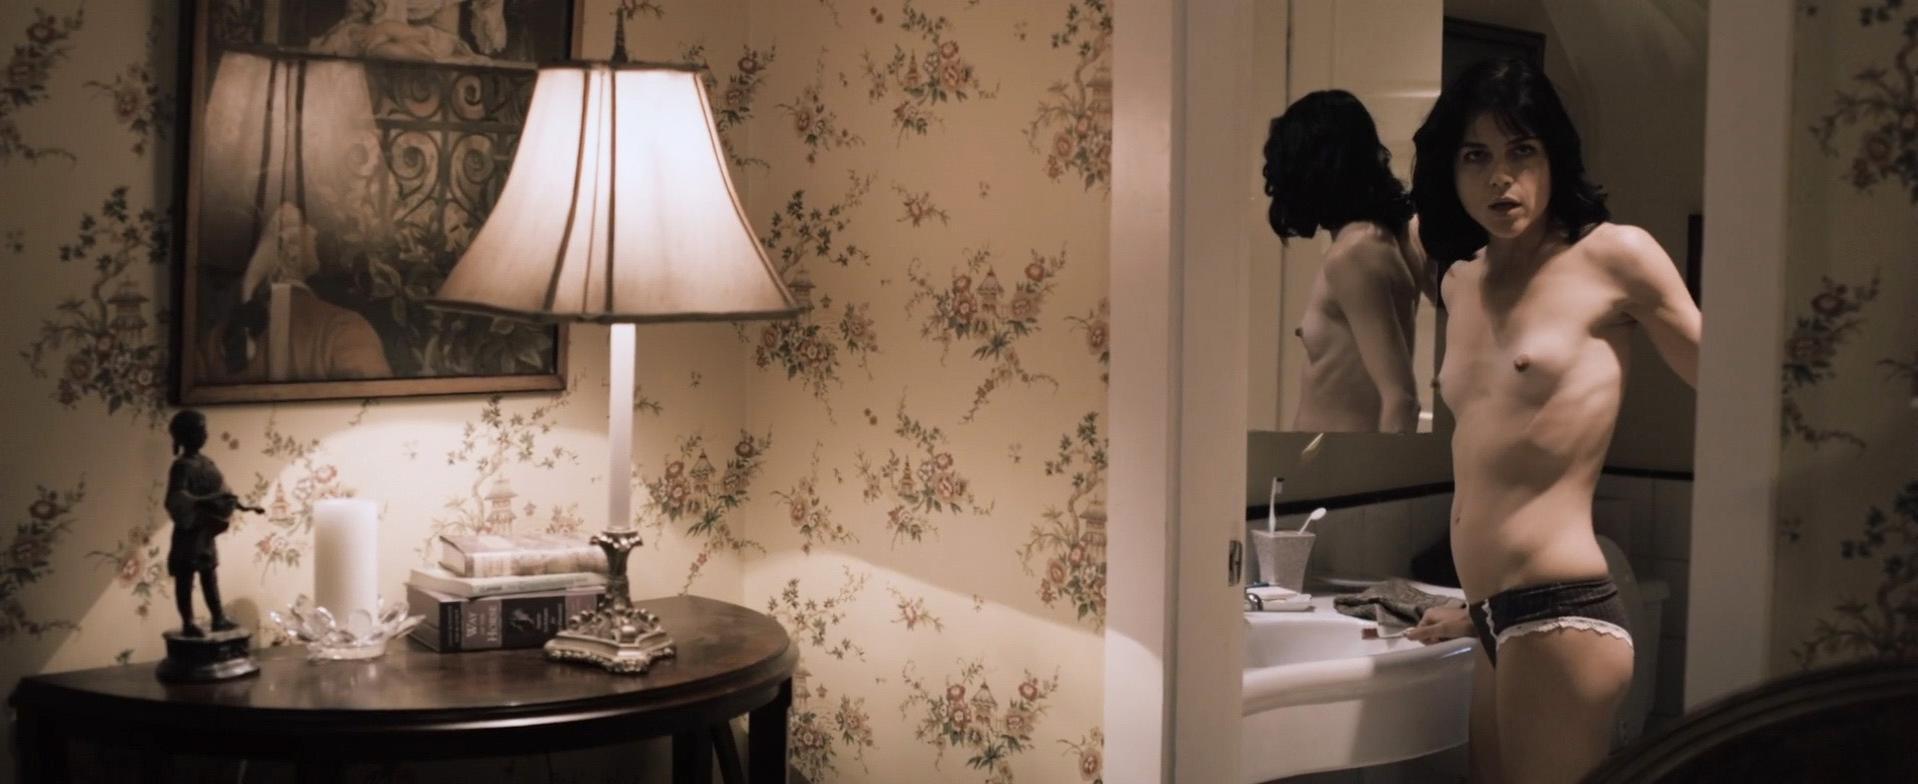 Selma Blair nude - In Their Skin (2012)